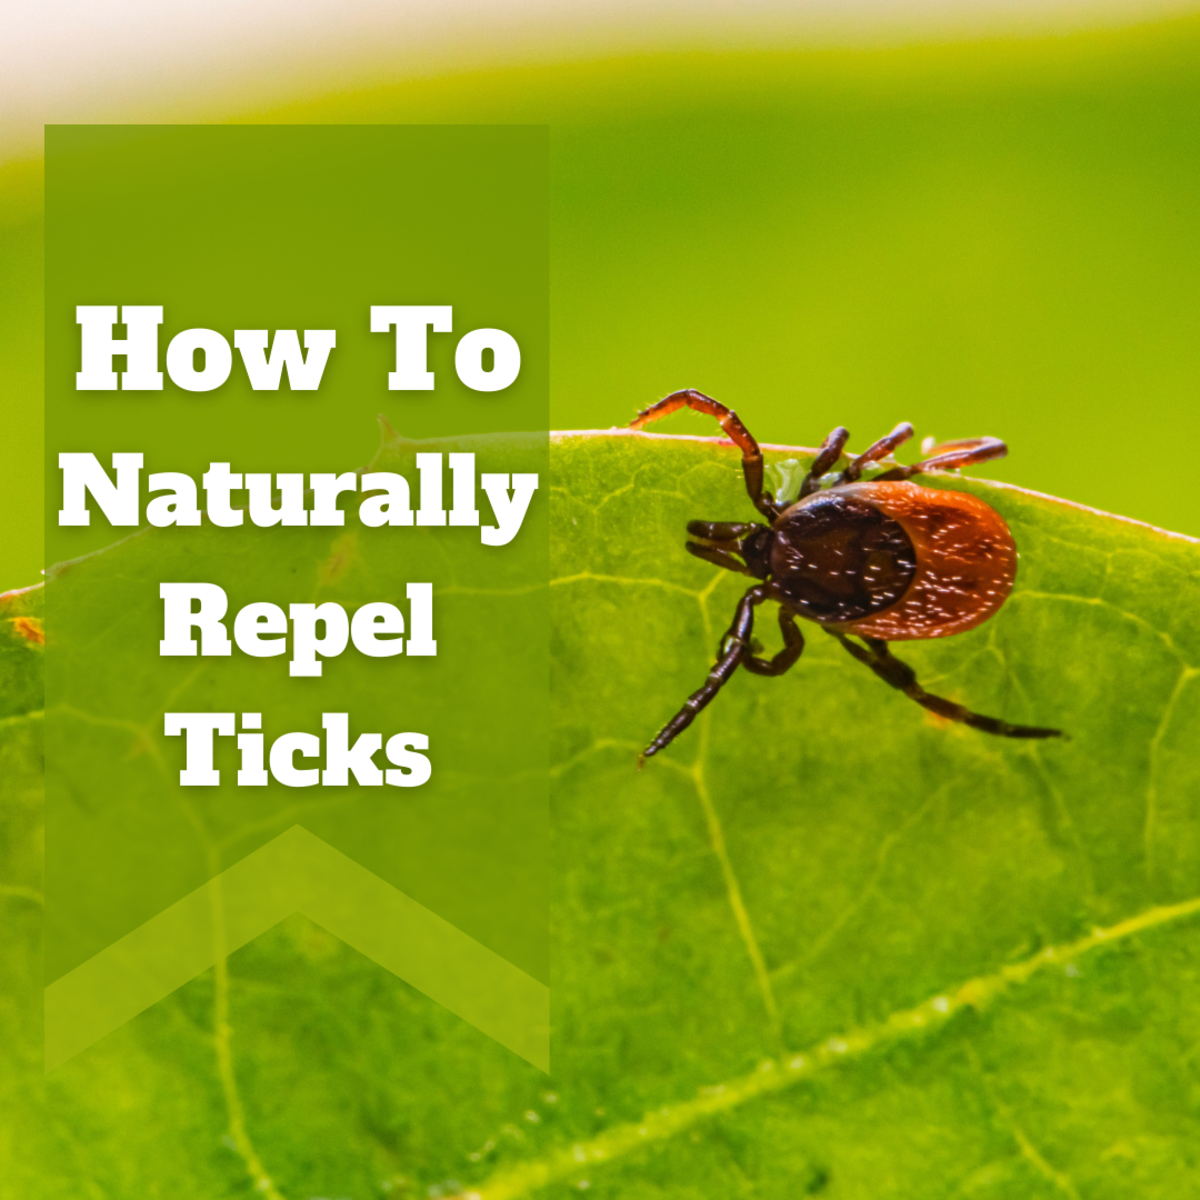 How to Repel Ticks Naturally